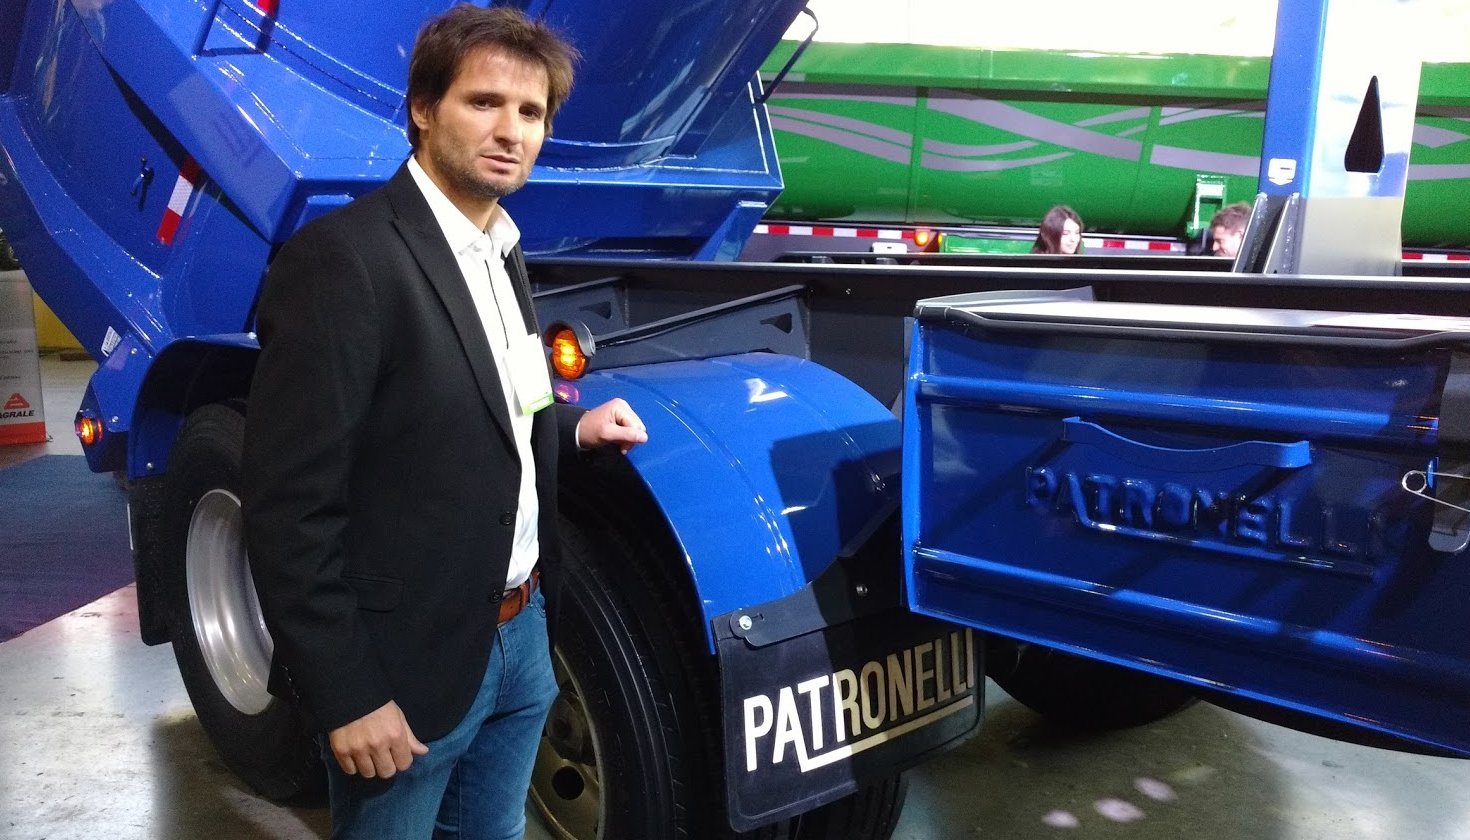 Los Patronelli no van al @dakar 2017. @patronelliok le contó a @corsaonline el motivo. https://t.co/52TVzUe5Gi https://t.co/wre3YwJmpM